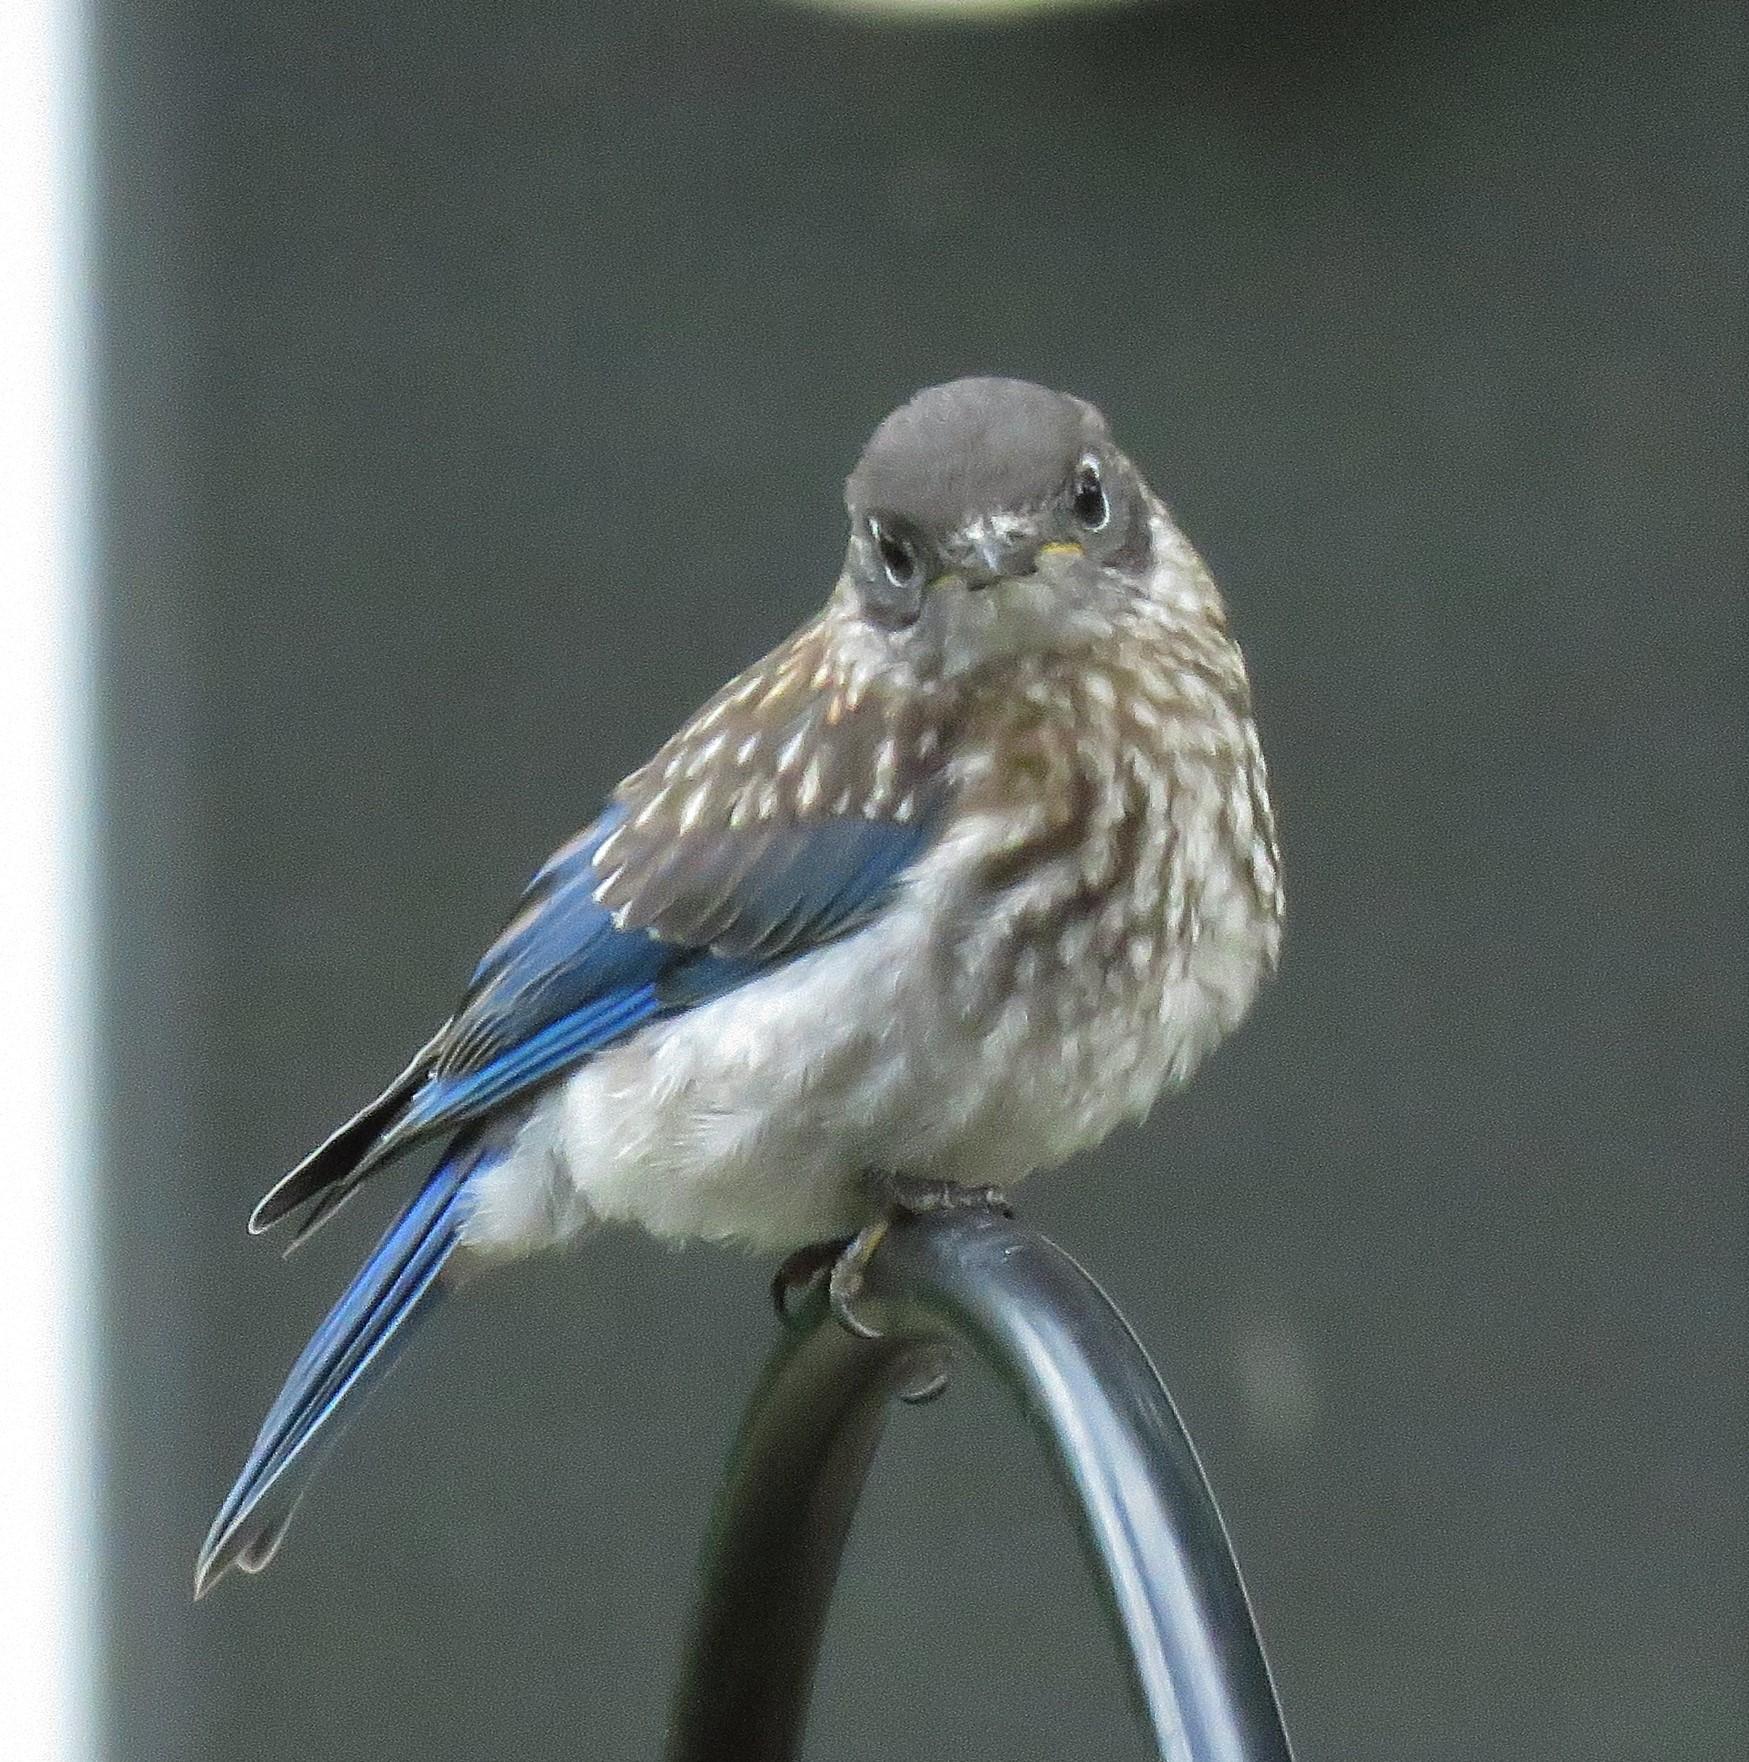 Eastern_bluebird - songbirds - birds